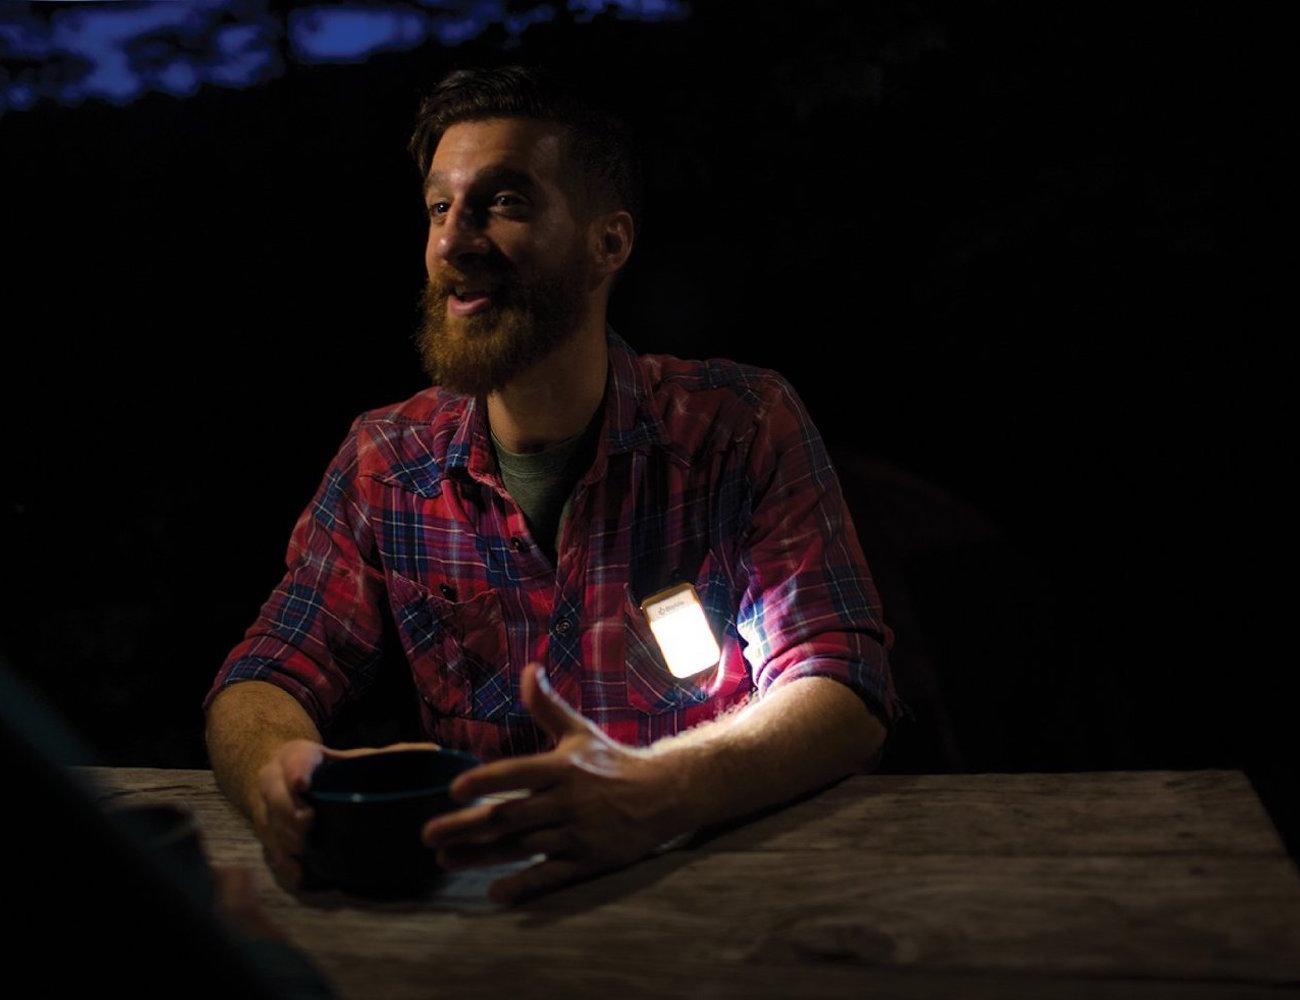 Biolite Mini Power Light